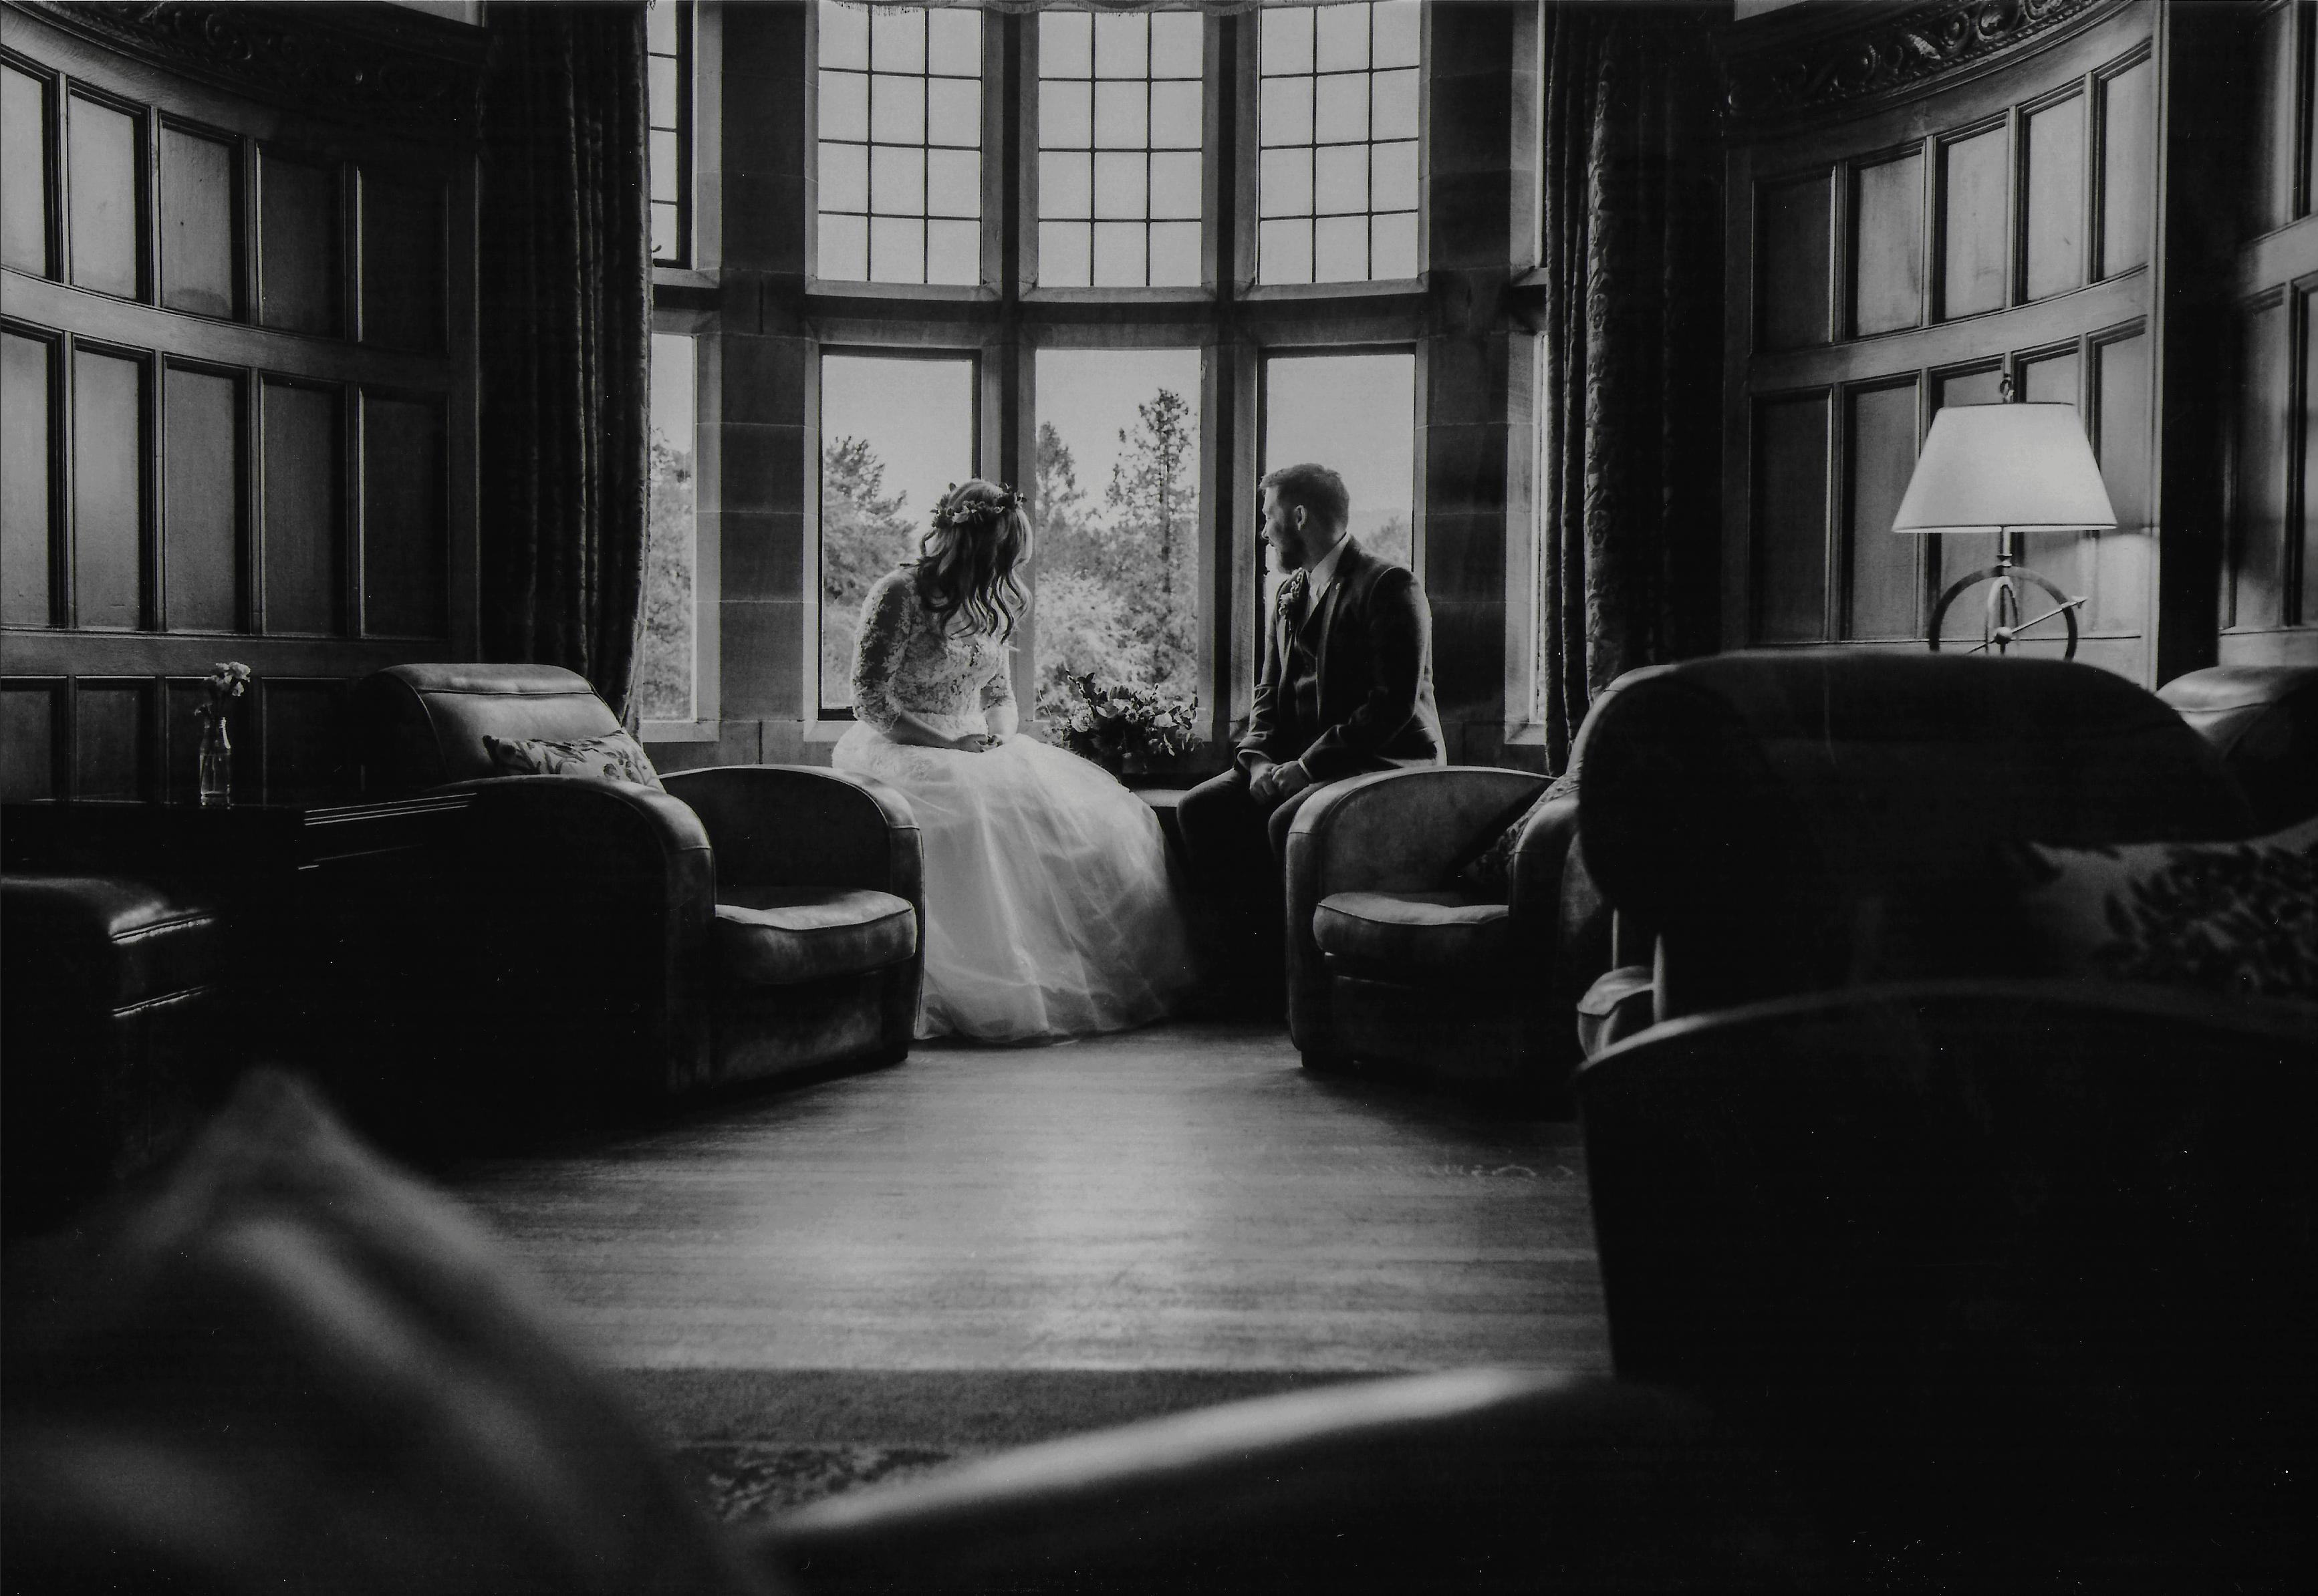 Where to print your wedding photos DSCL photo print